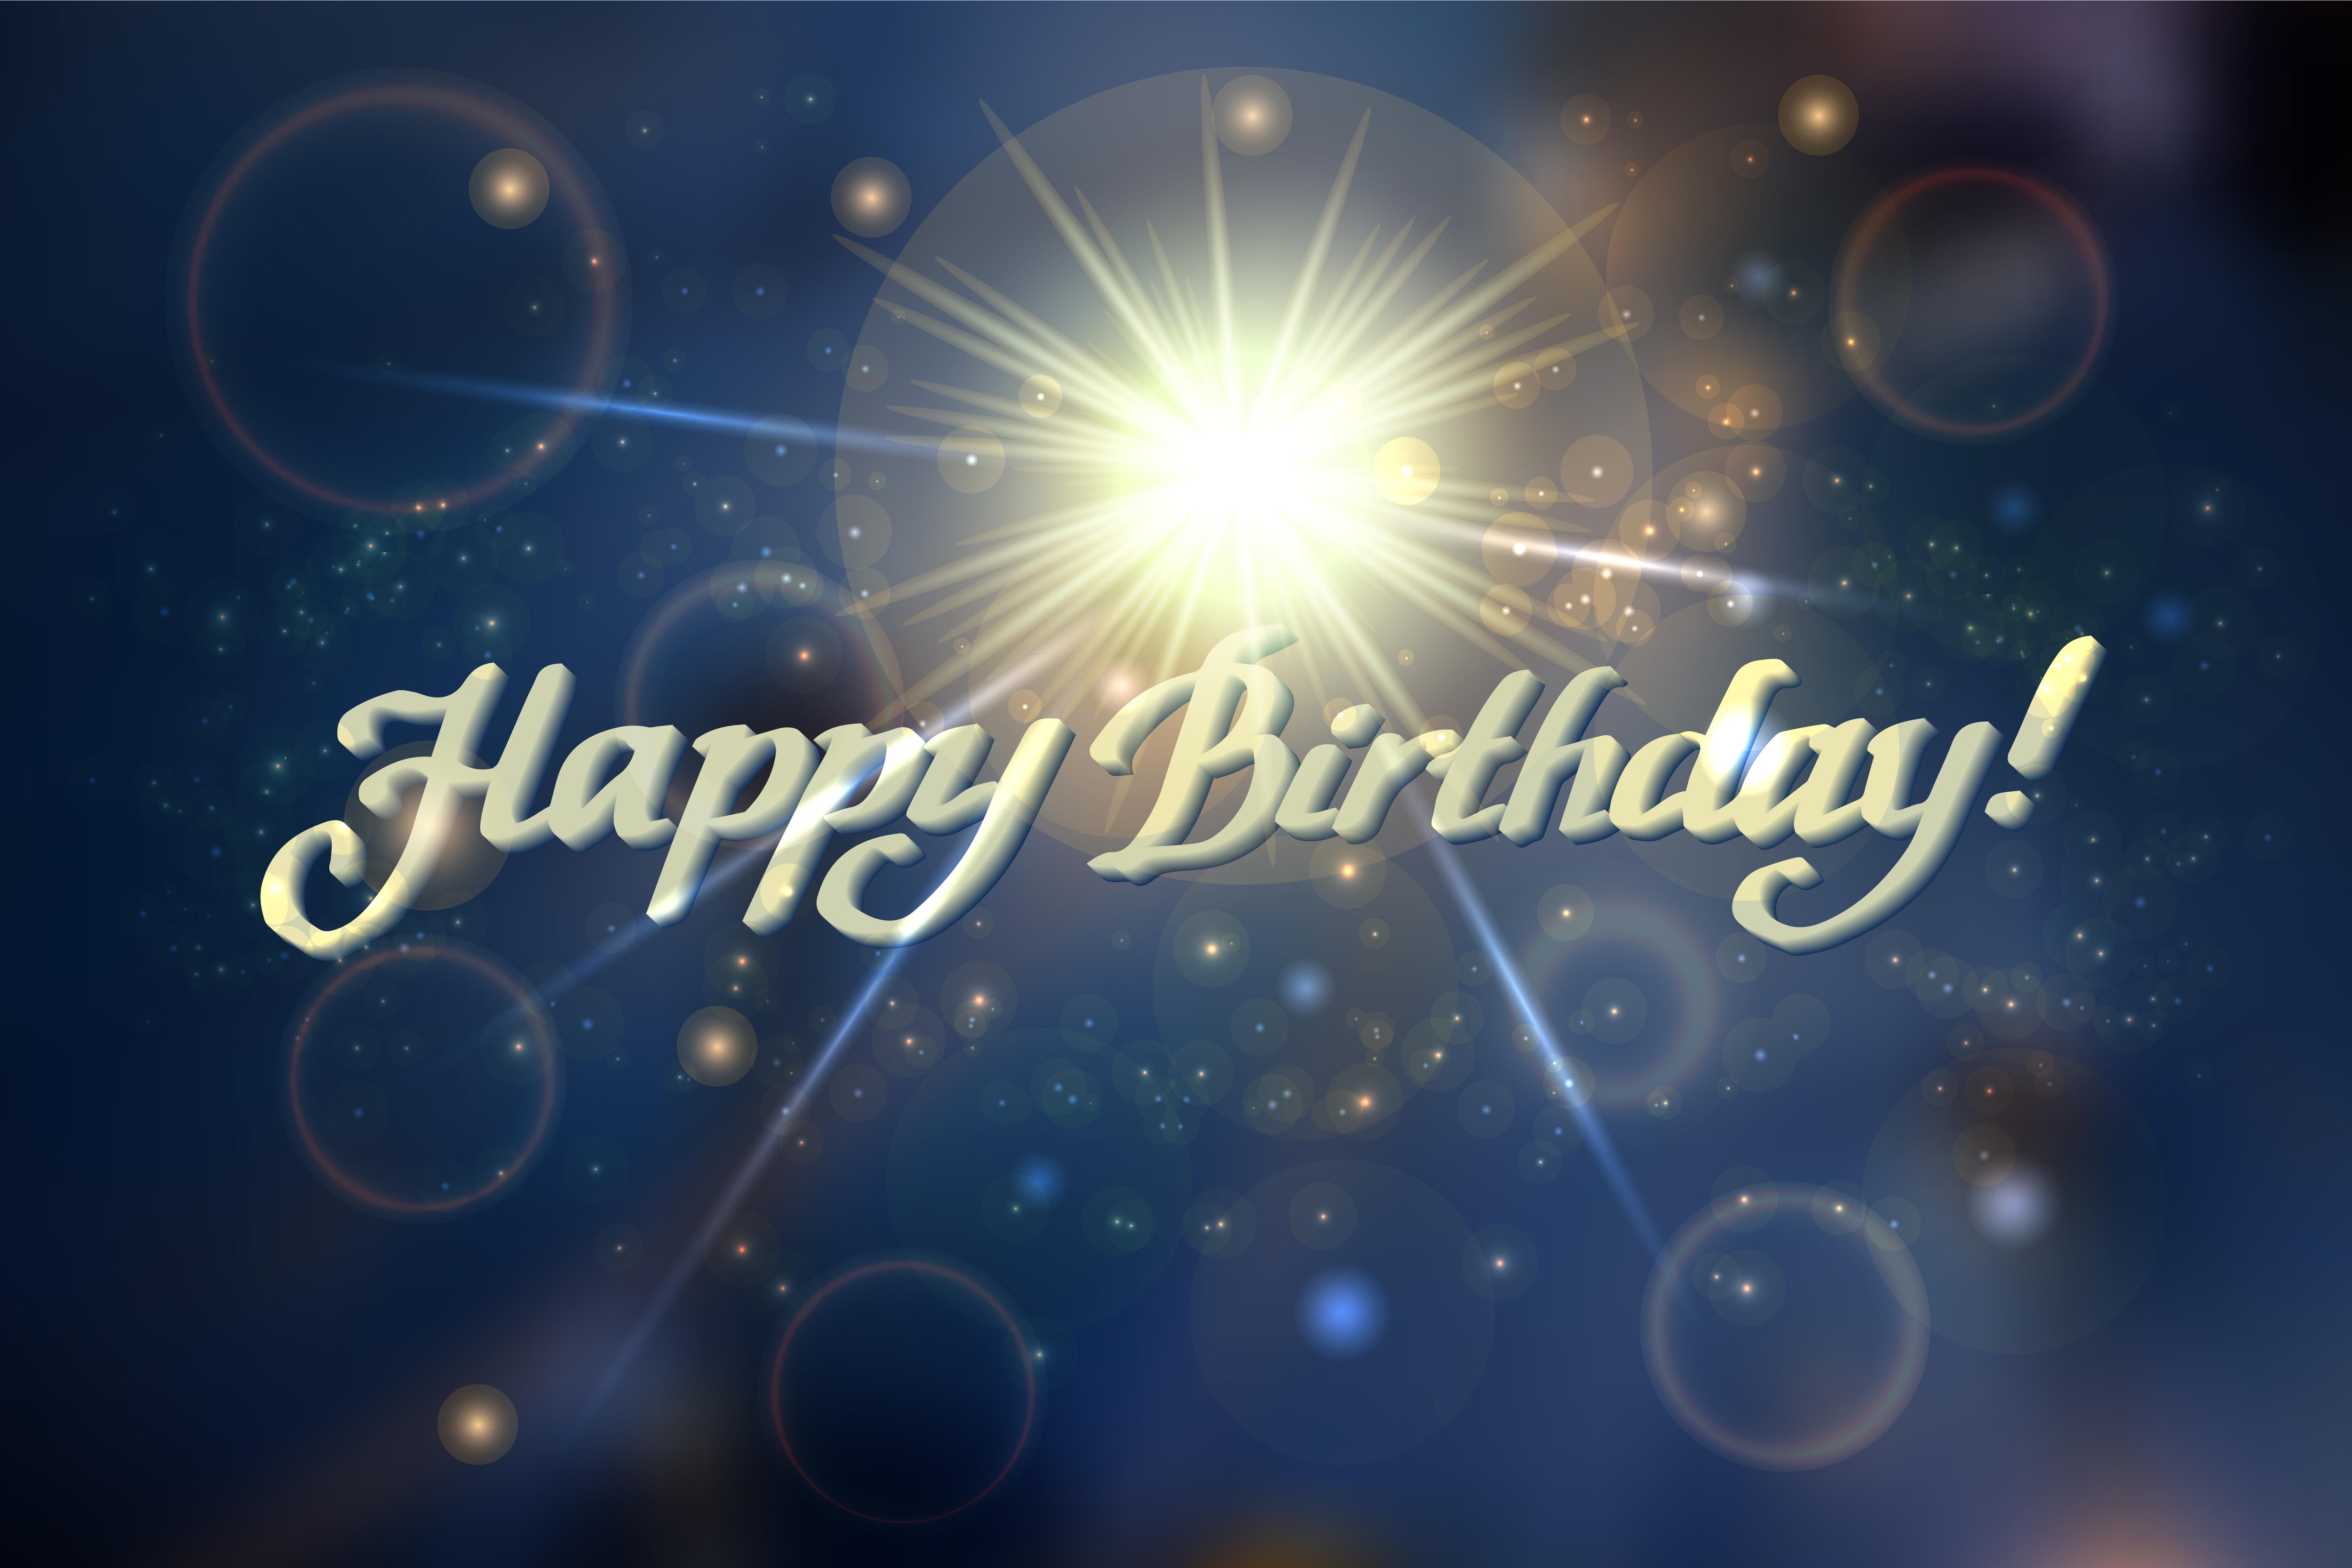 №33 Greeting Card Happy Birthday